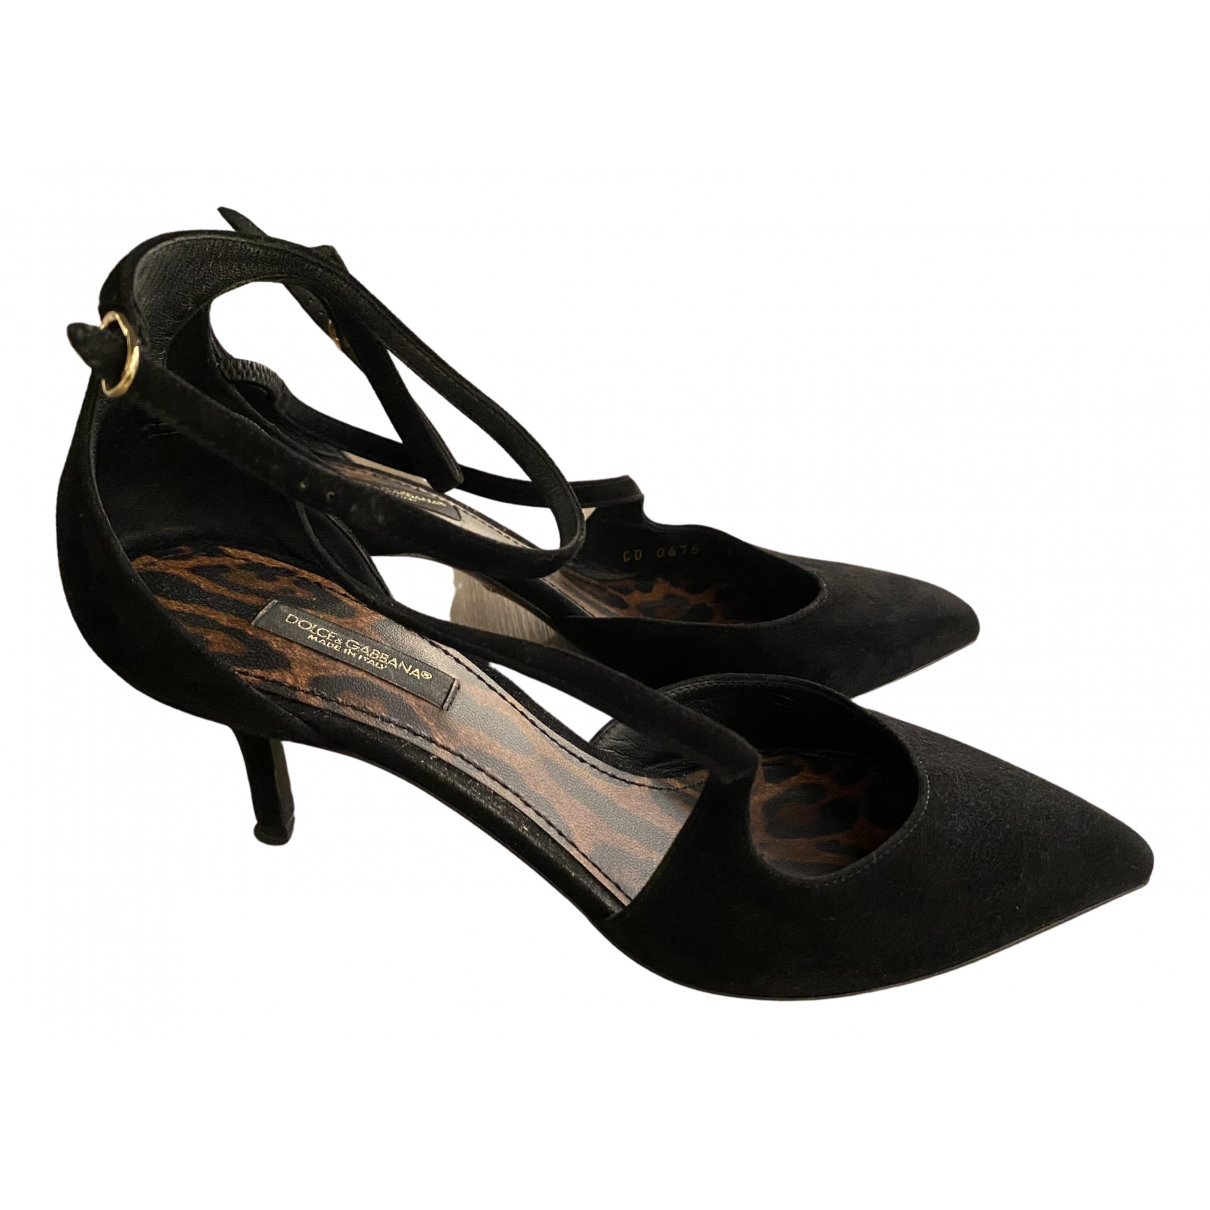 Sandalias romanas Dolce & Gabbana